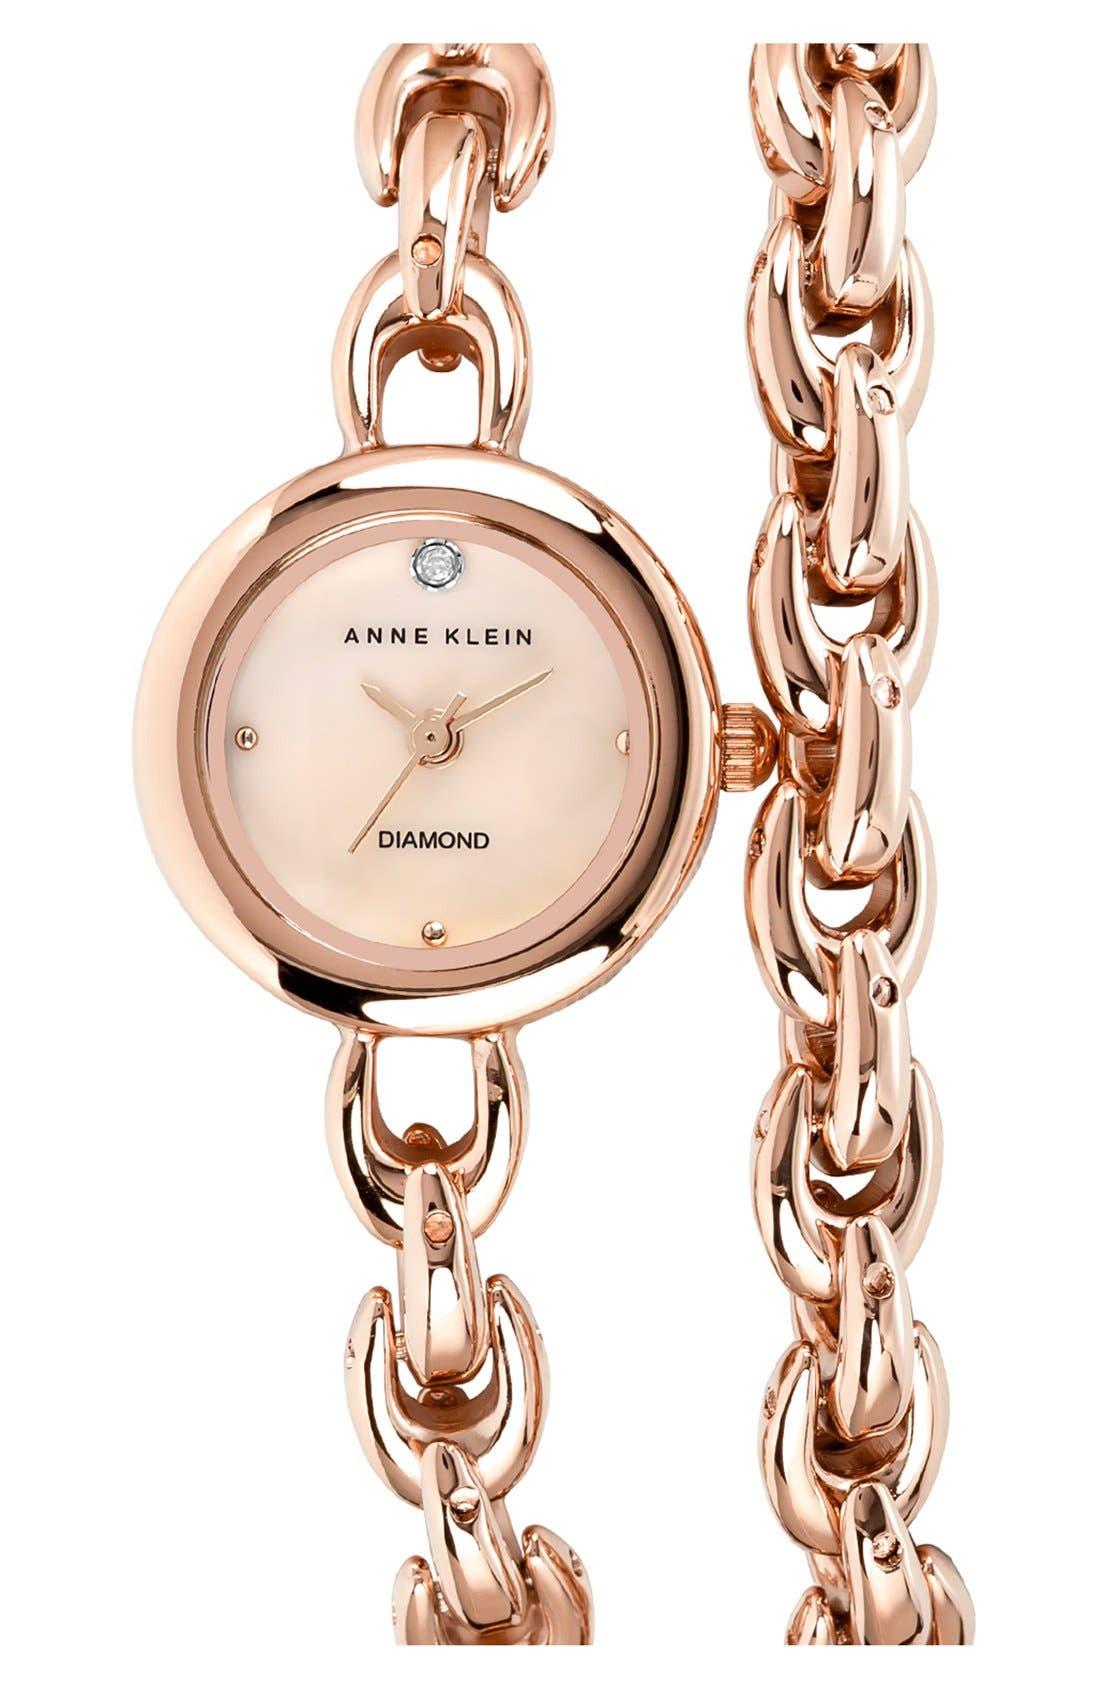 Main Image - Anne Klein Diamond Accent Double Wrap Bracelet Watch, 20mm